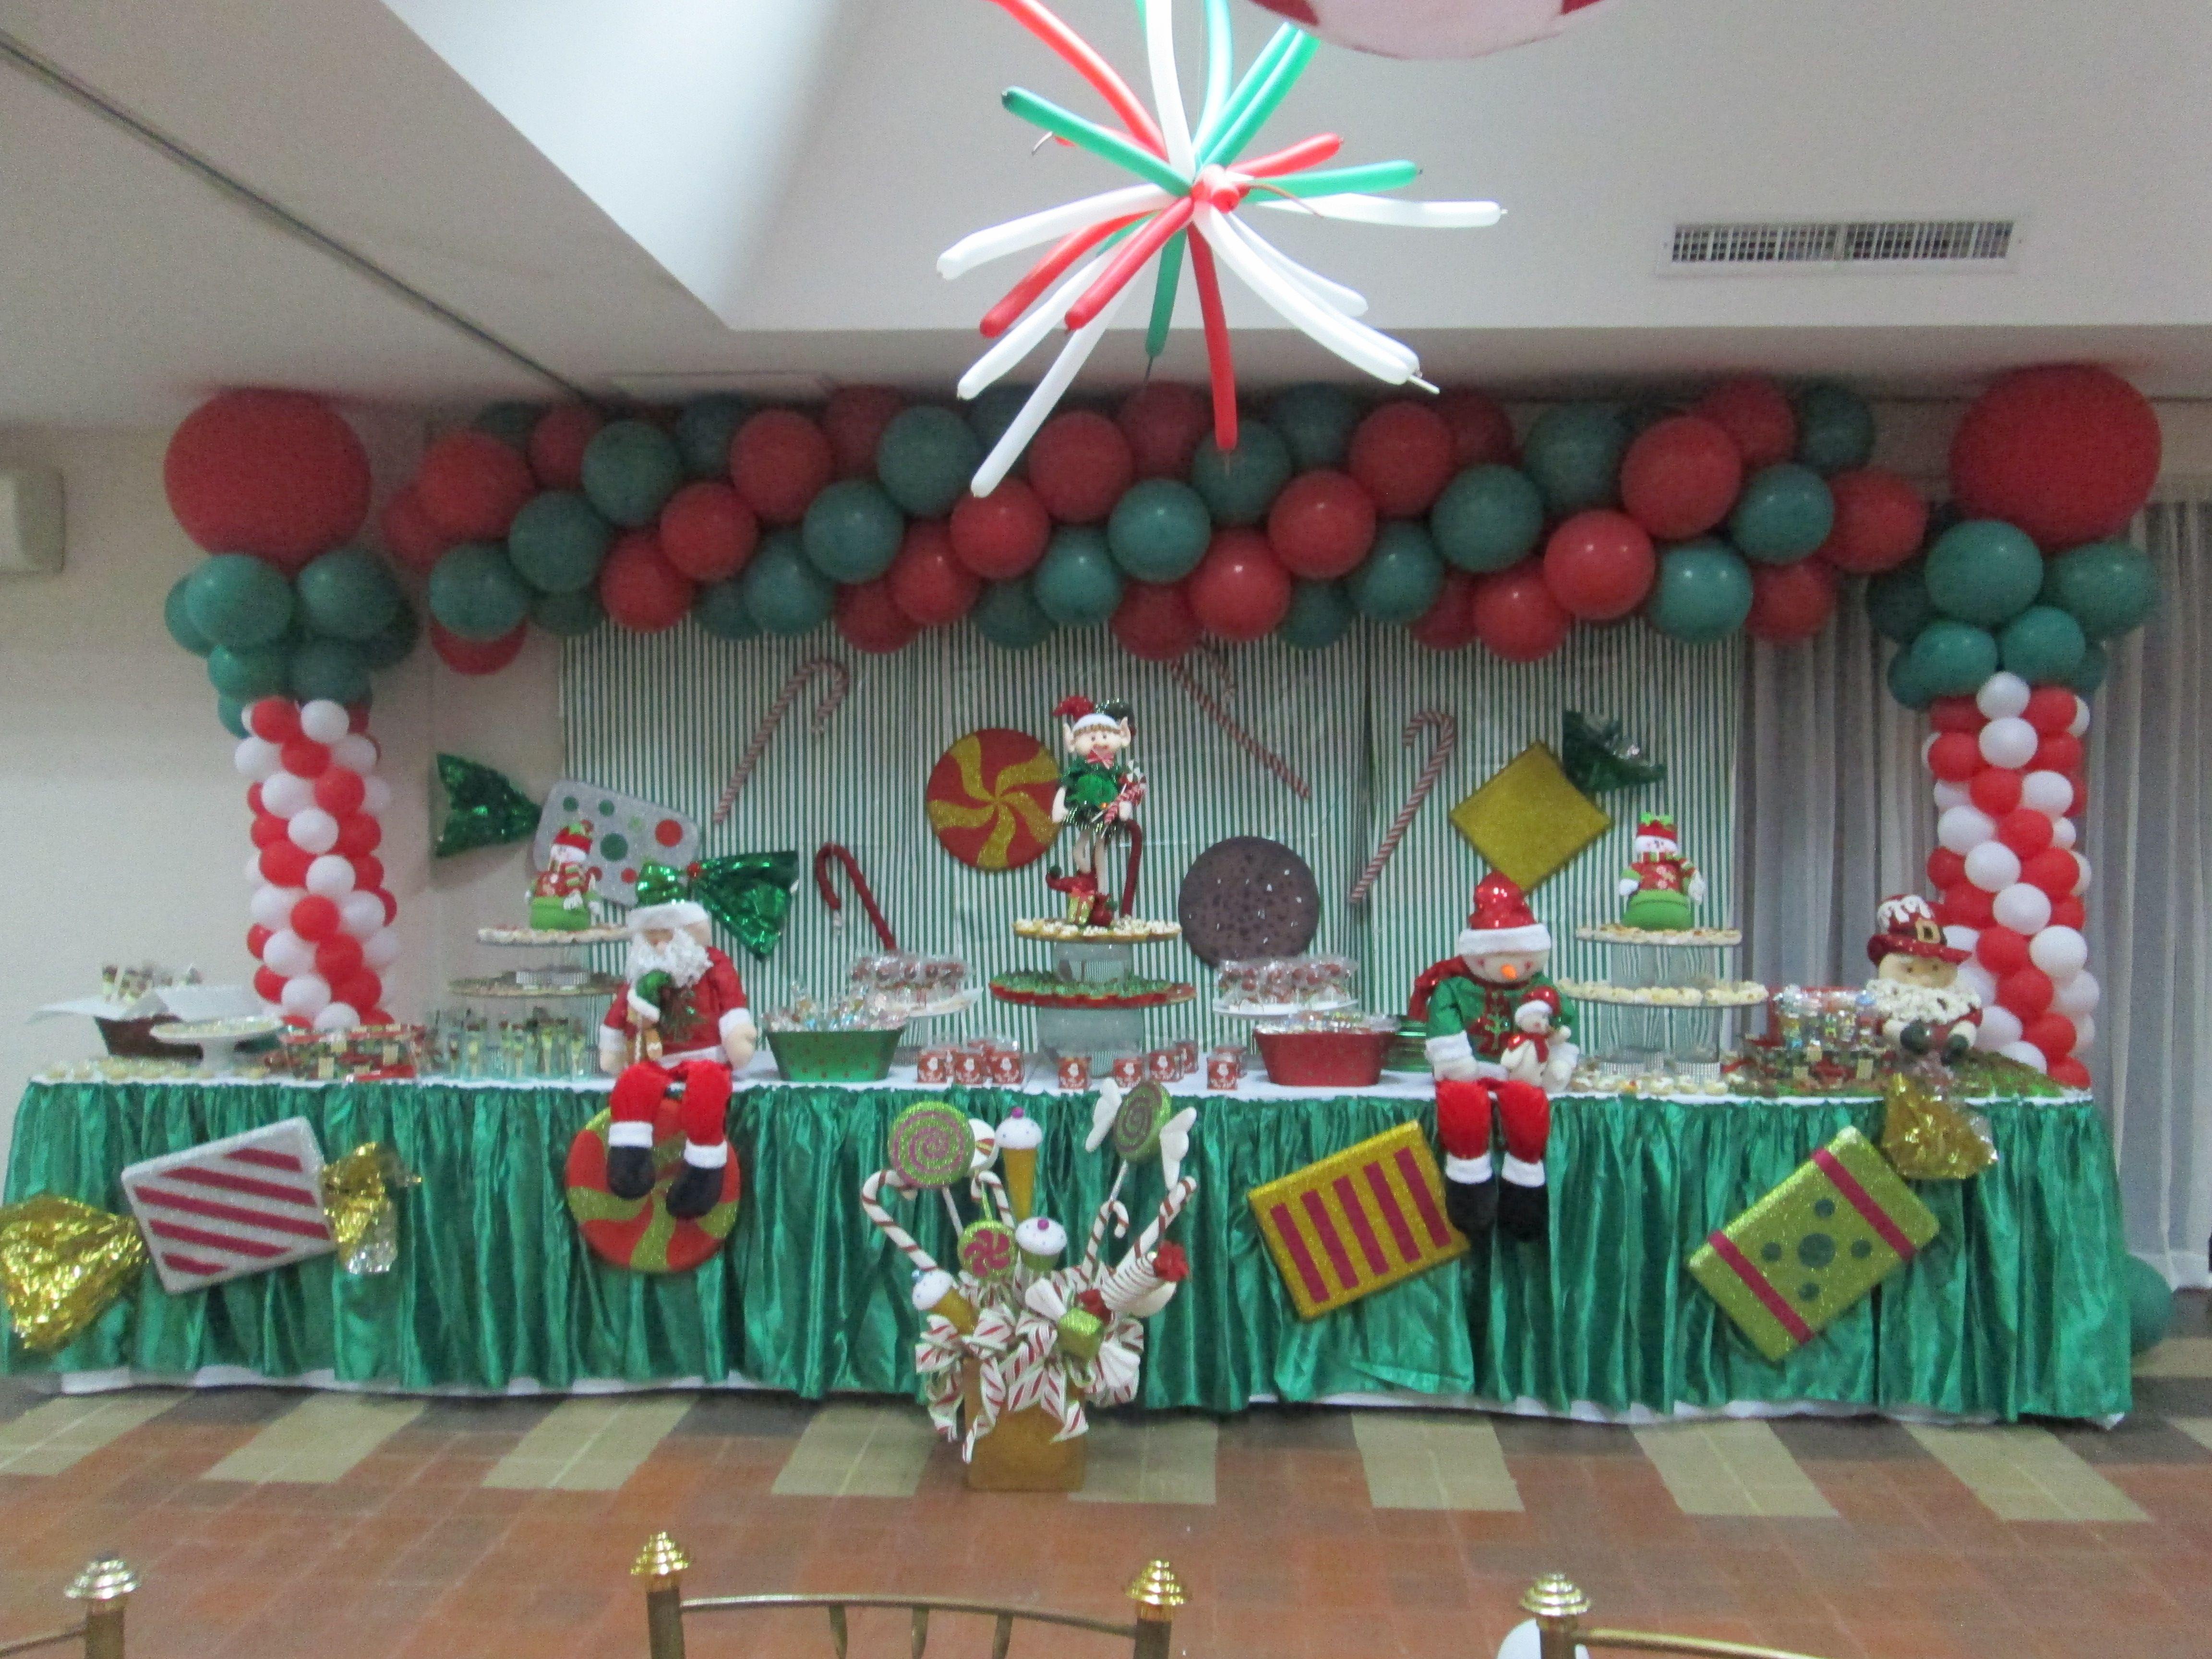 Mesa de dulces motivo navidad decoracion de cumplea os - Decoracion navidad infantil ...